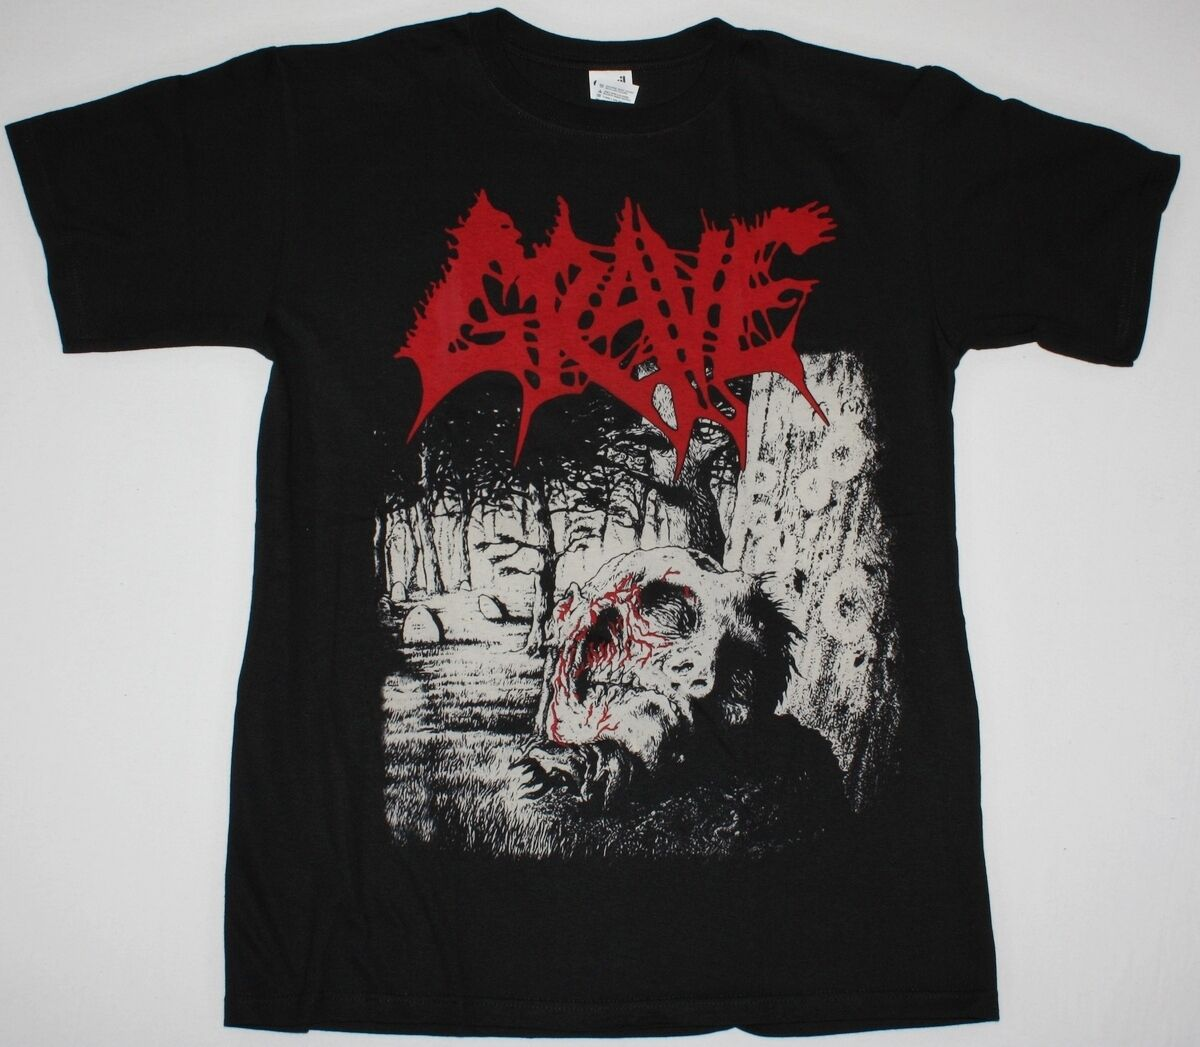 GRAVE NECROPSY THE COMPLETE DEMO'86 91 GORGUTS LOUDBLAST DEATH NEW BLACK T SHIRT Cheap Wholesale tees,100% Cotton Tee Shirt